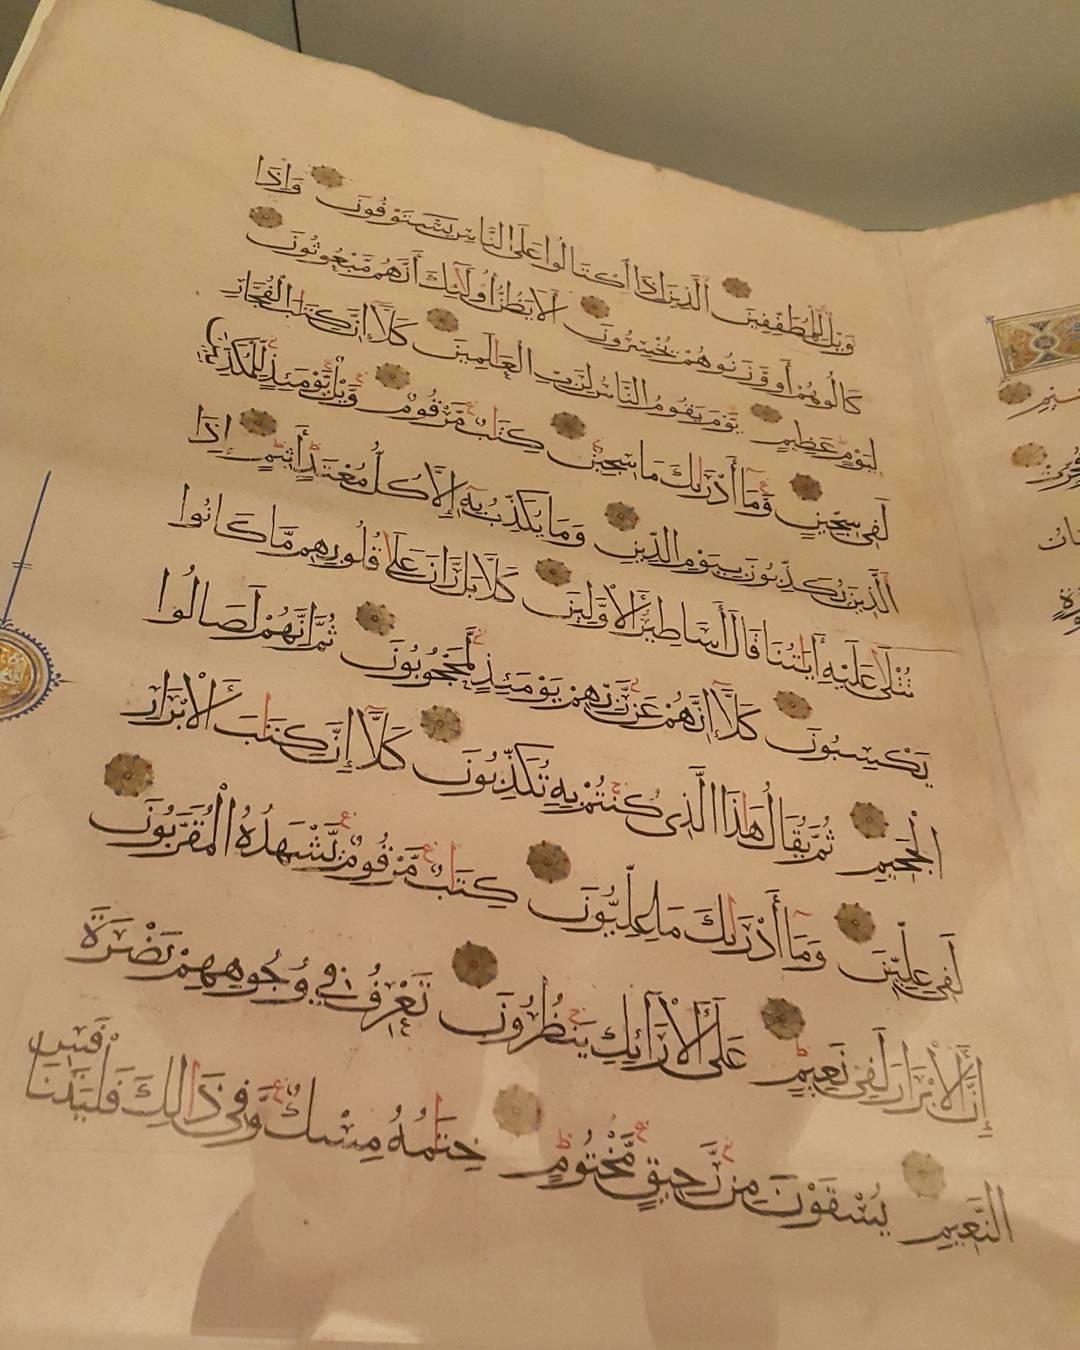 Khat Diwani Ajhalawani/Amr مصحف من العصر المملوكي مكتوب ب #خط_المحقق الزمان : 1400 إلى 1500م. المكان: مصر…. 59